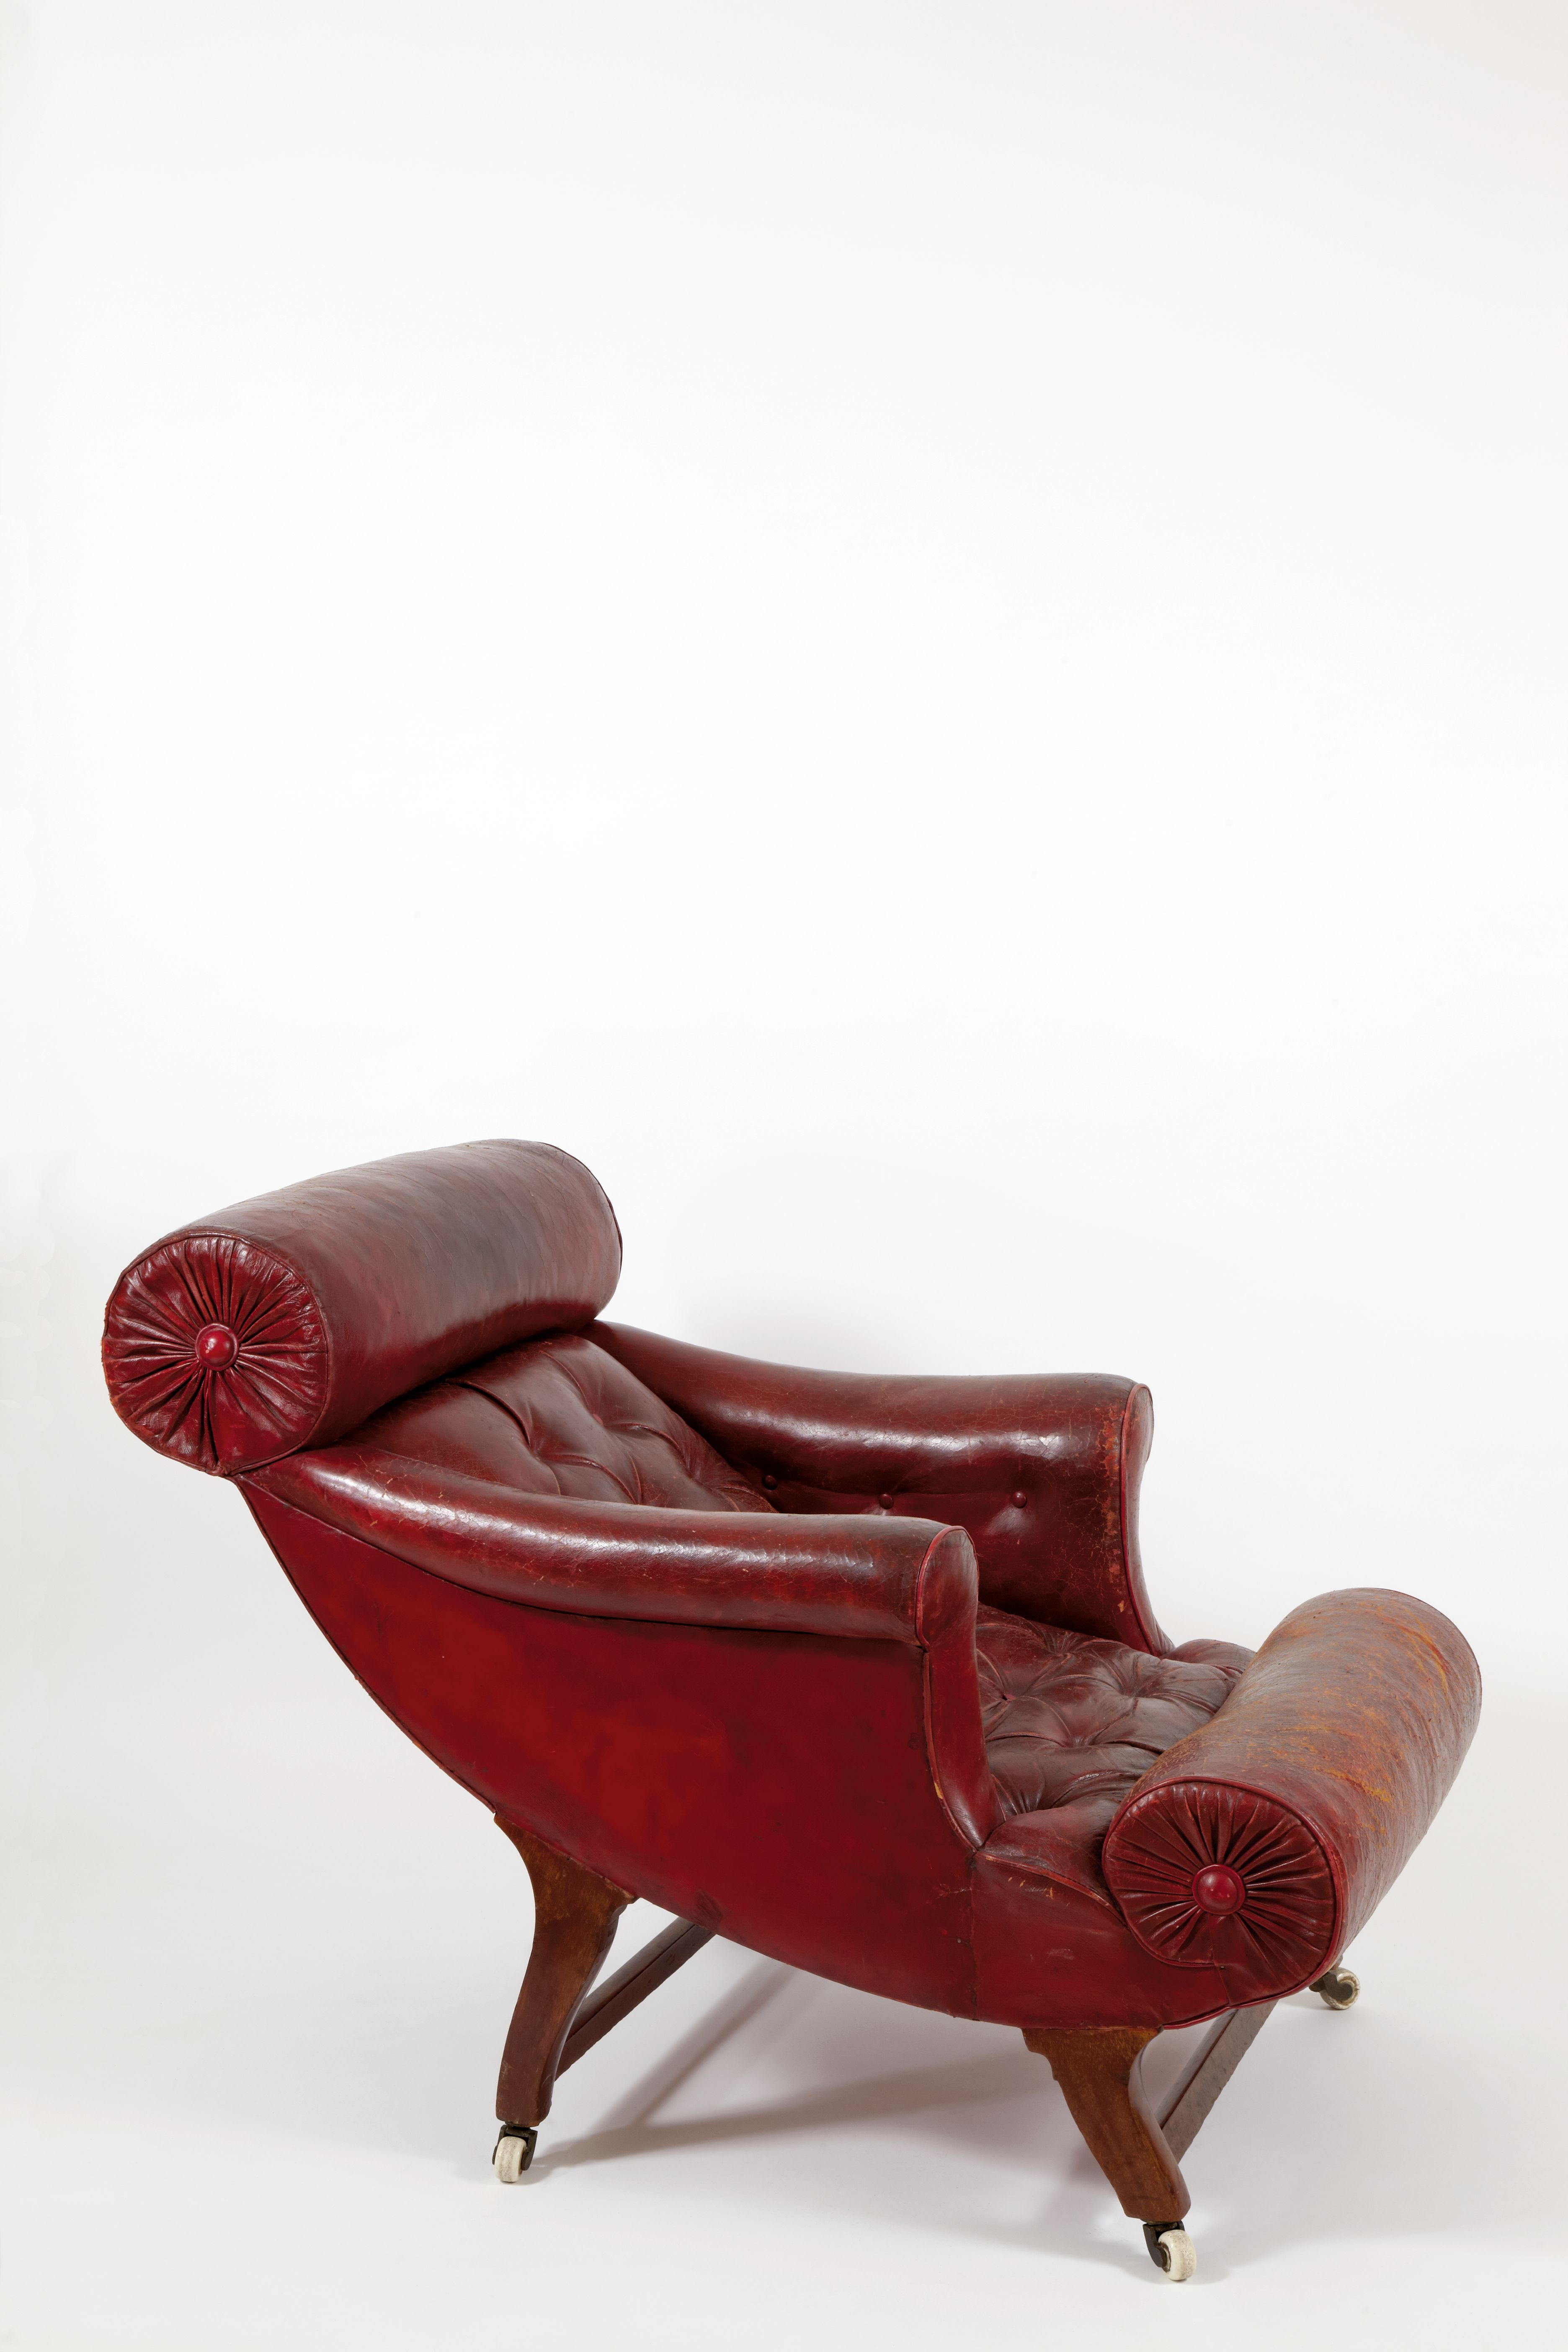 butaca-1907-utilizada-por-adolf-loos-f-o-schmidt-coleccion-hummel-viena-foto-gisela-erlacher